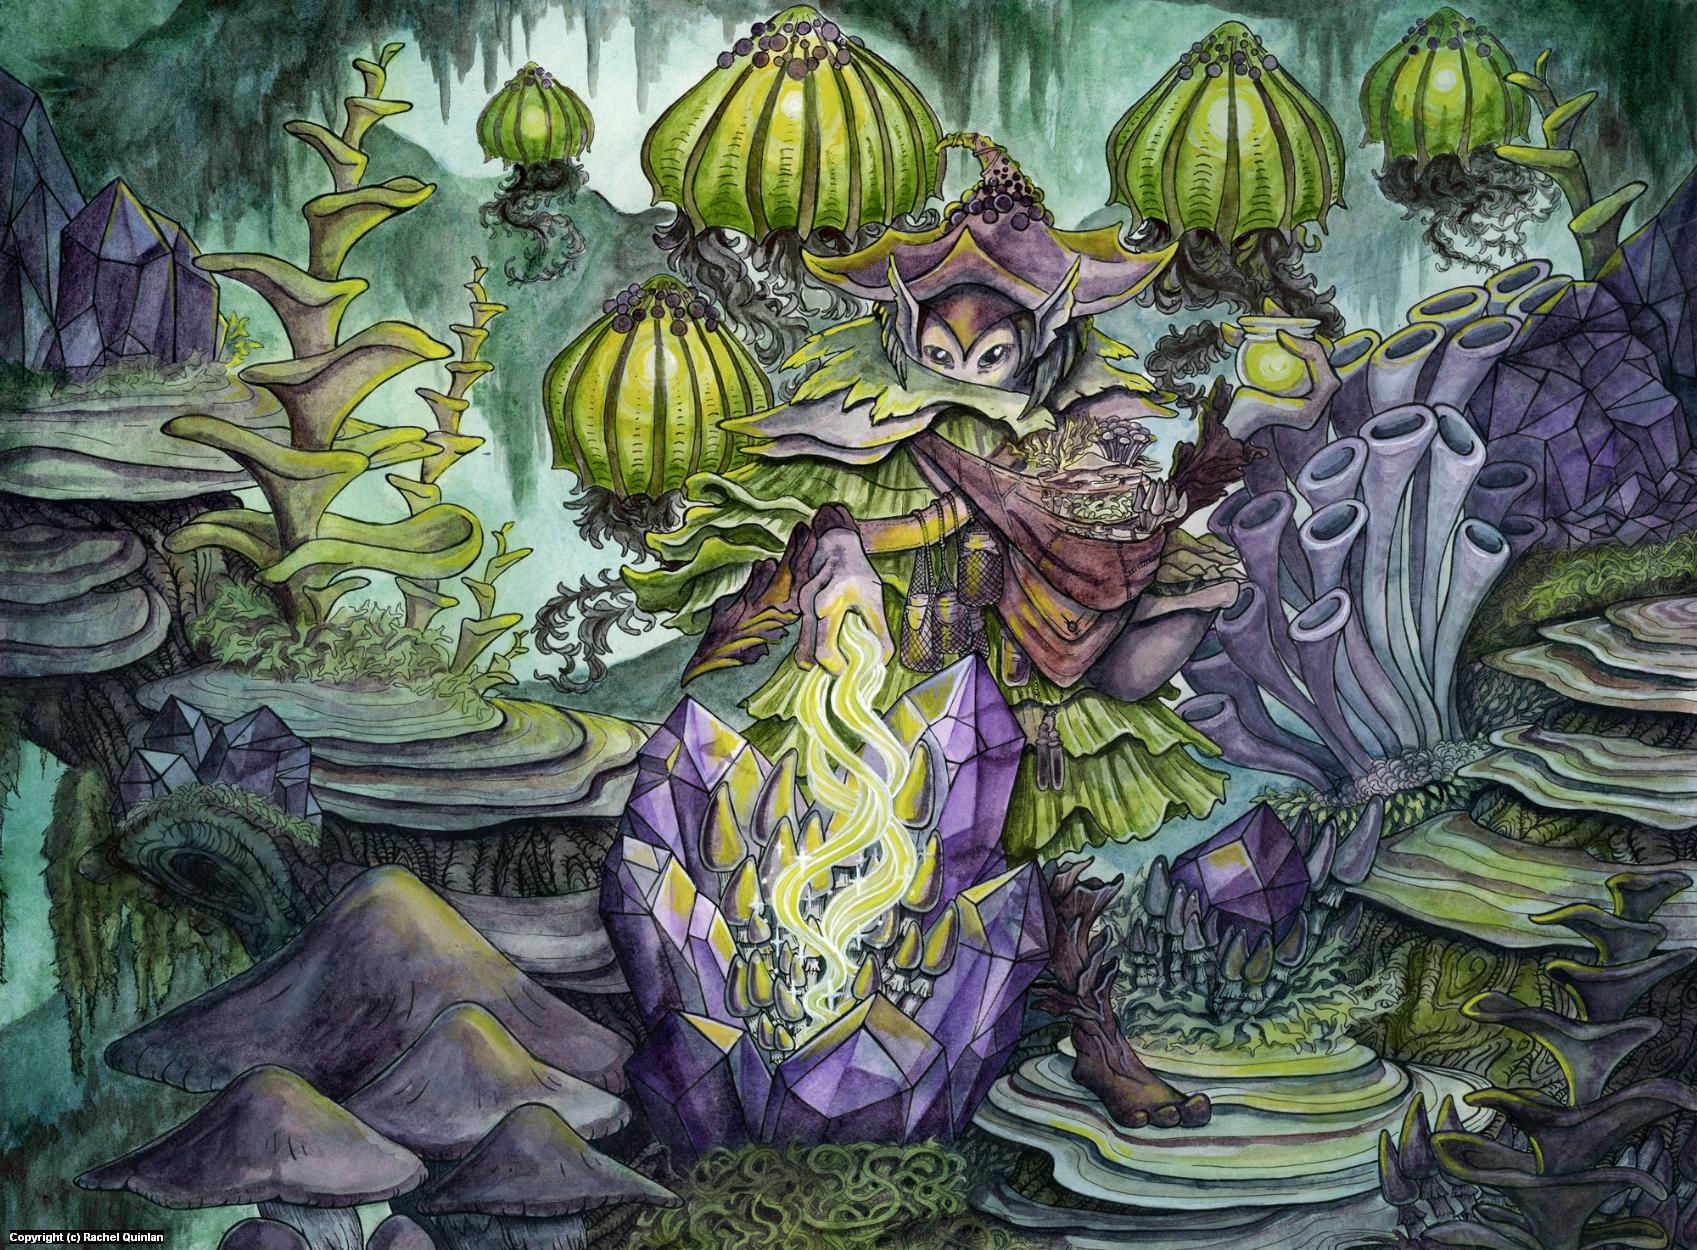 New Growth Artwork by Rachel Quinlan